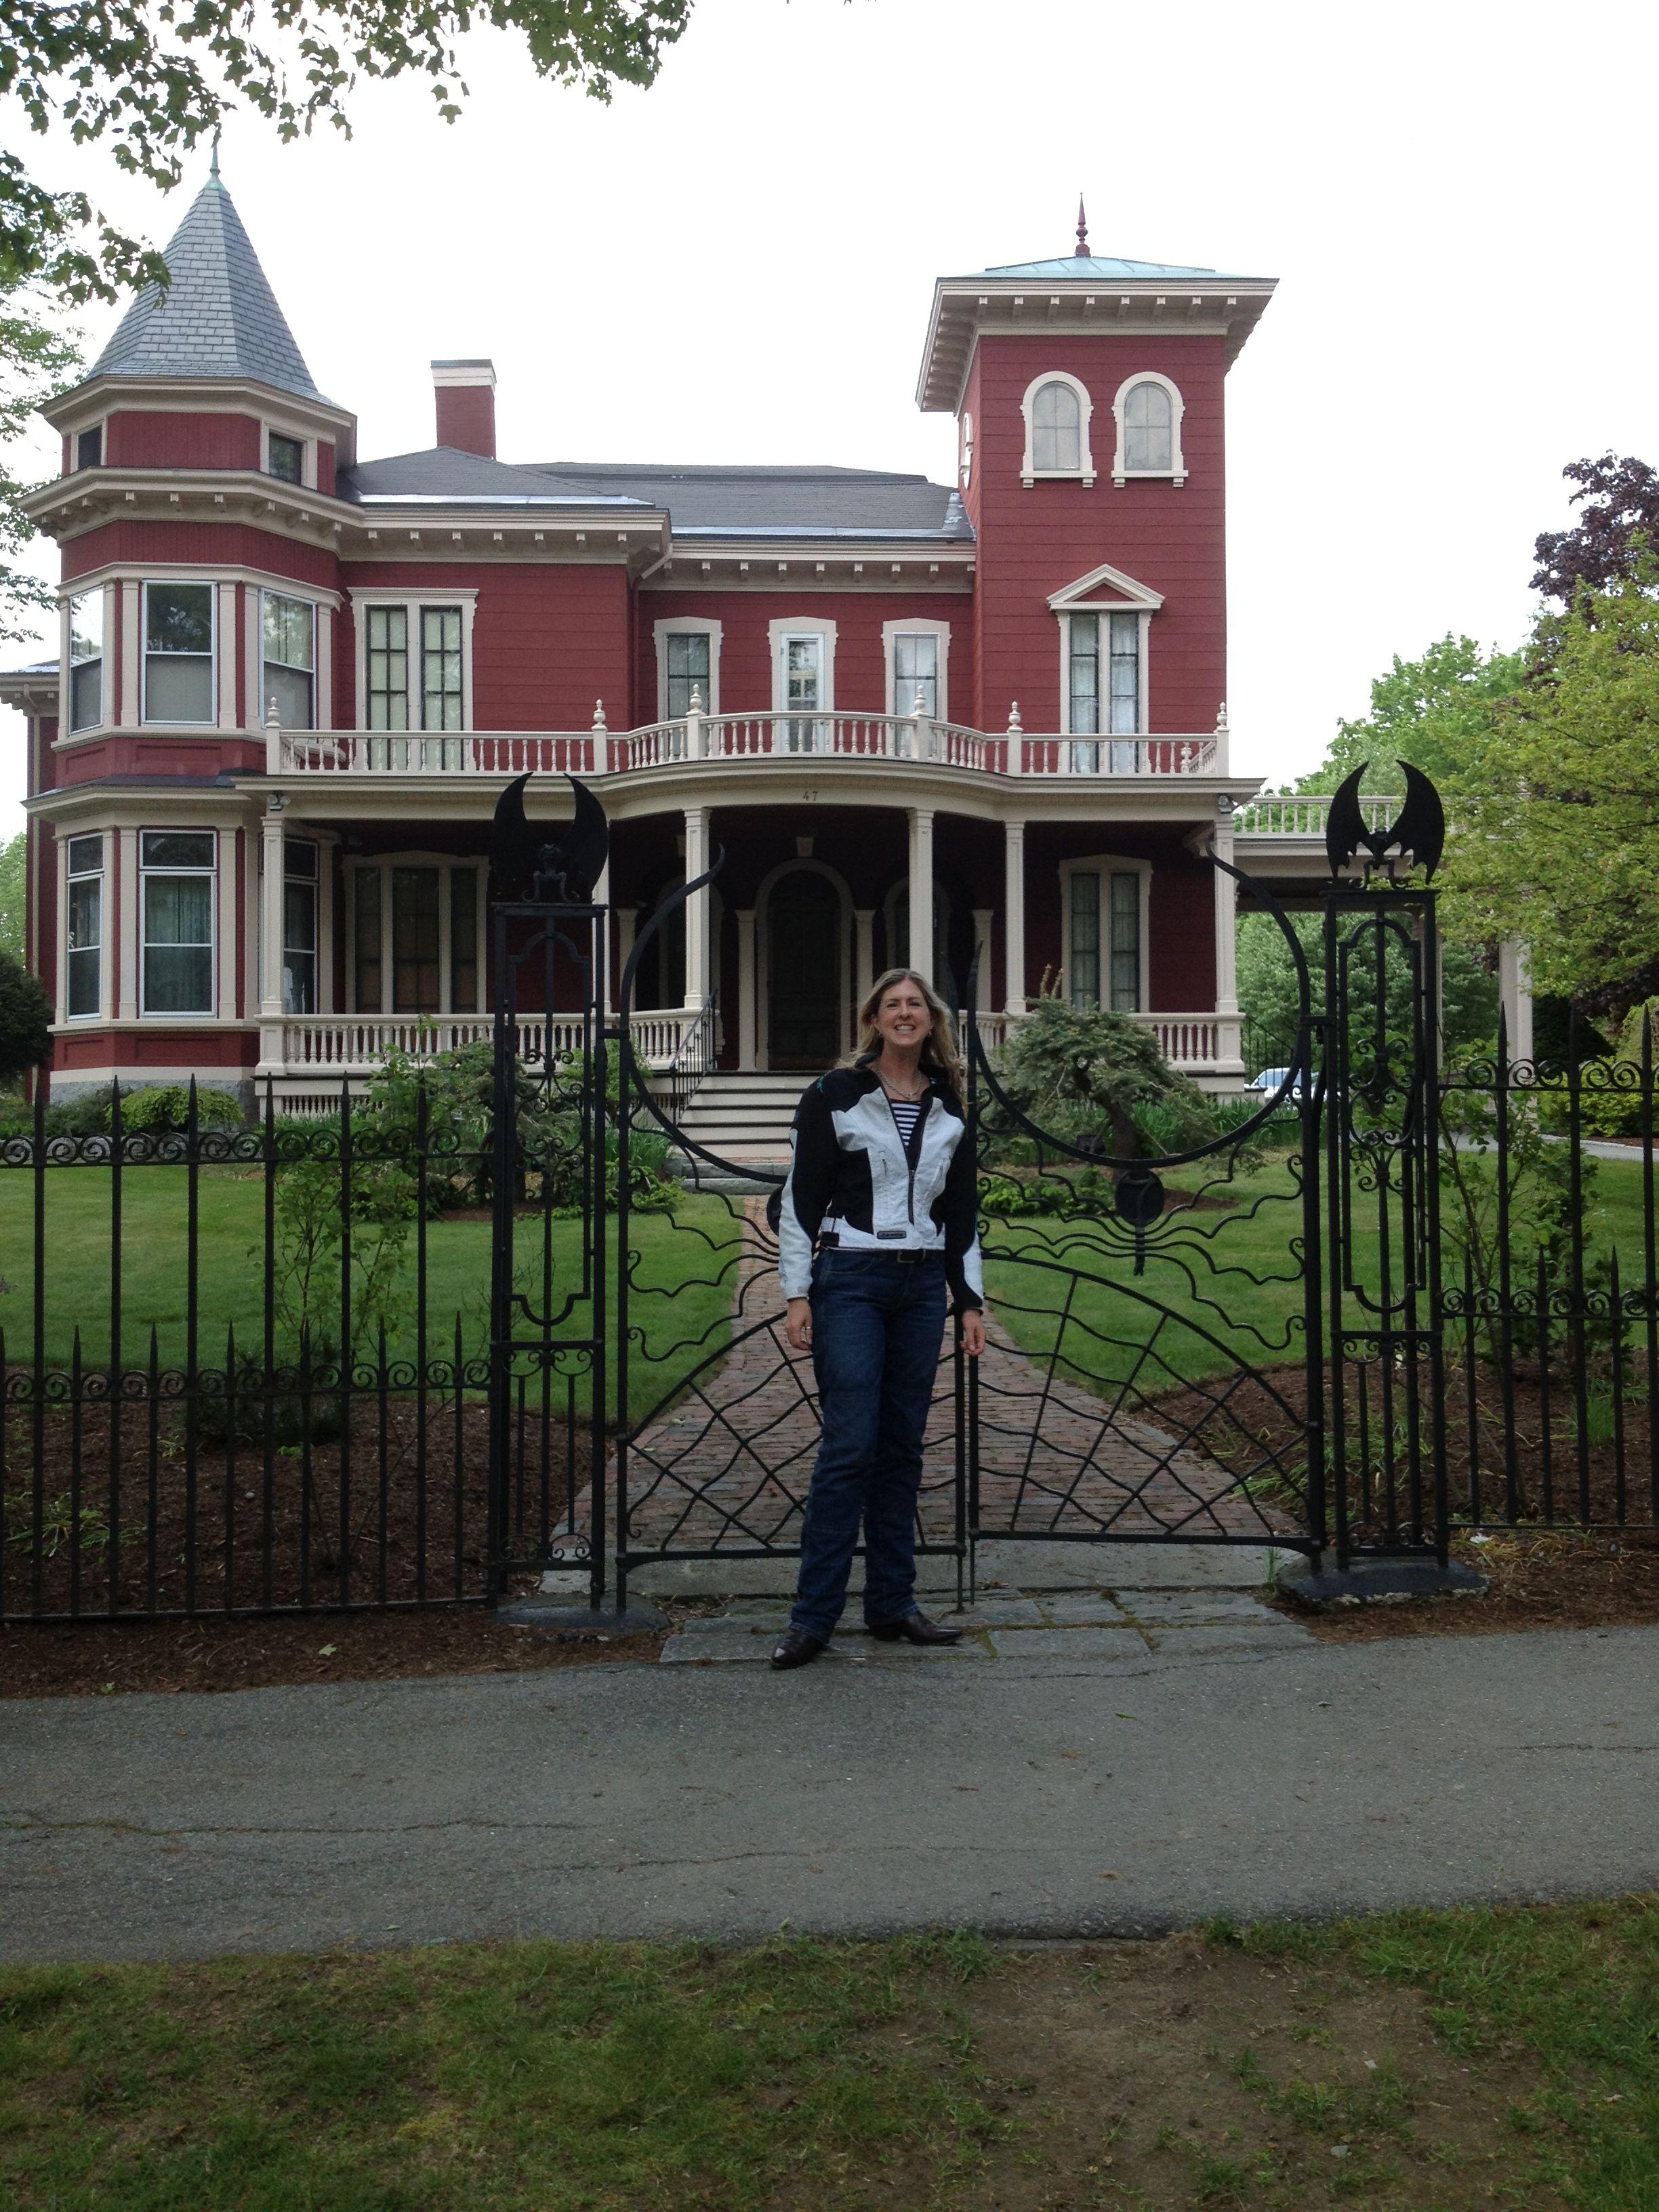 Stephen King's House Bangor Maine | Haus